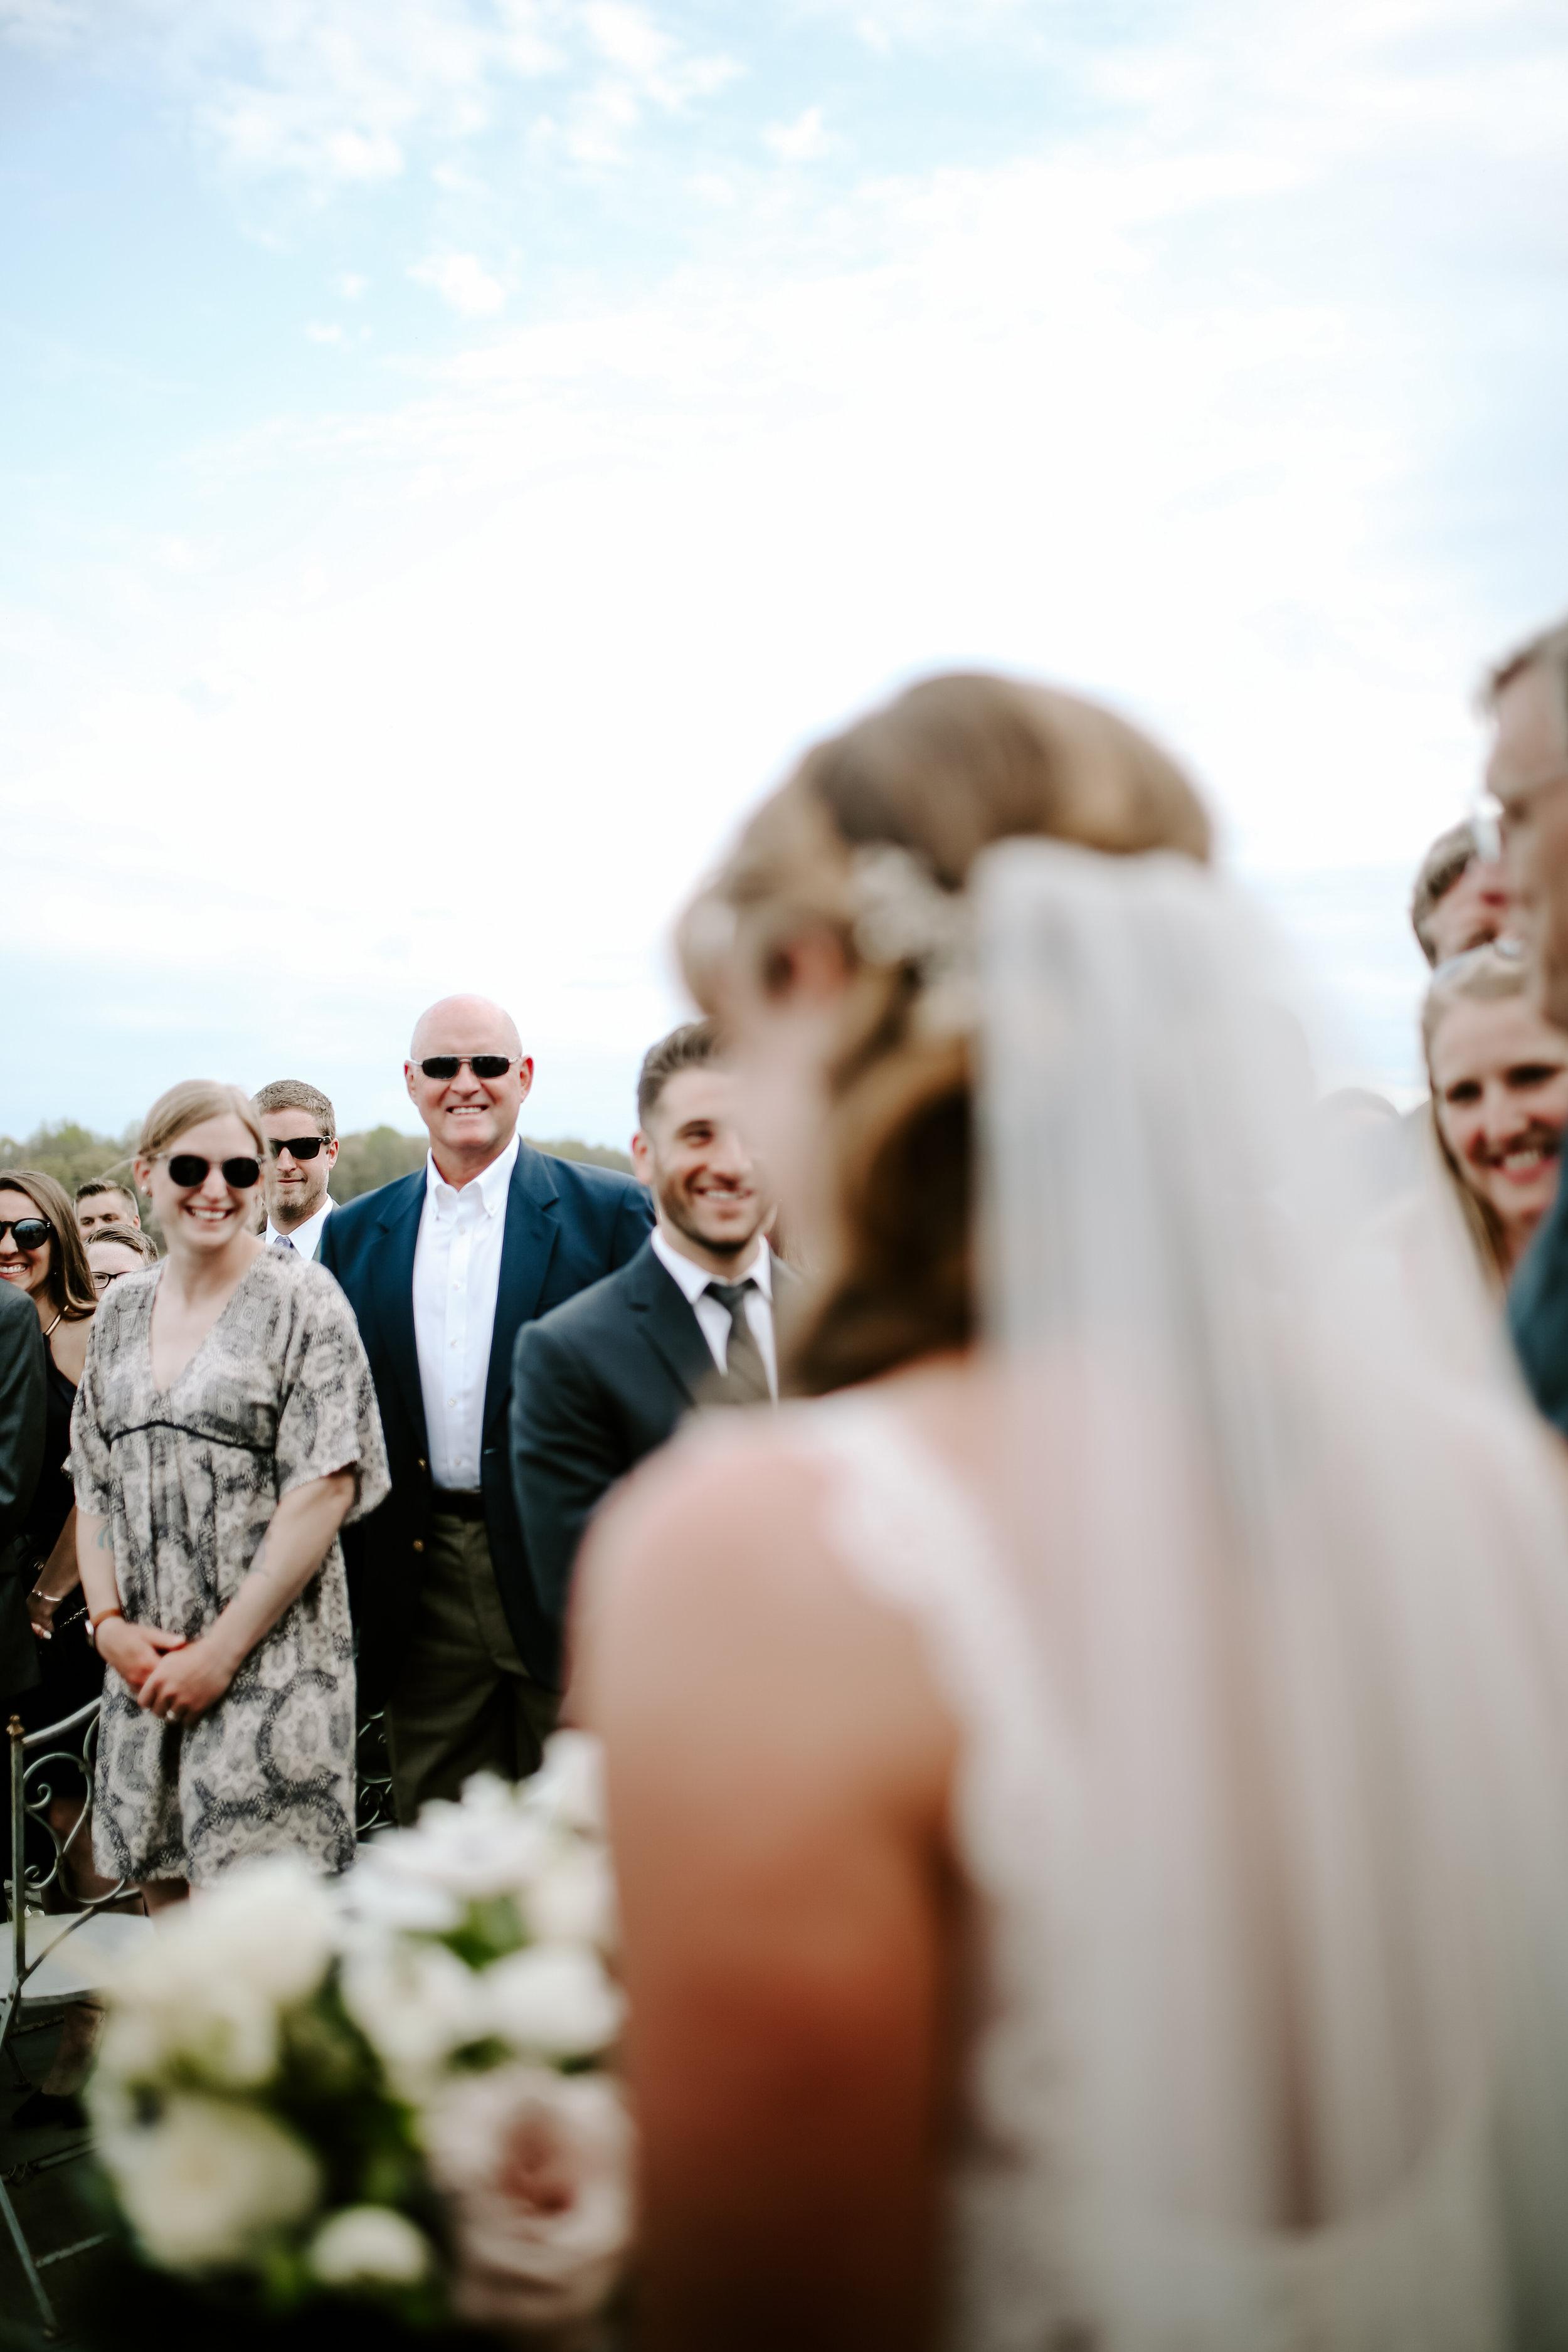 TheGreens_Married_2019-284.jpg